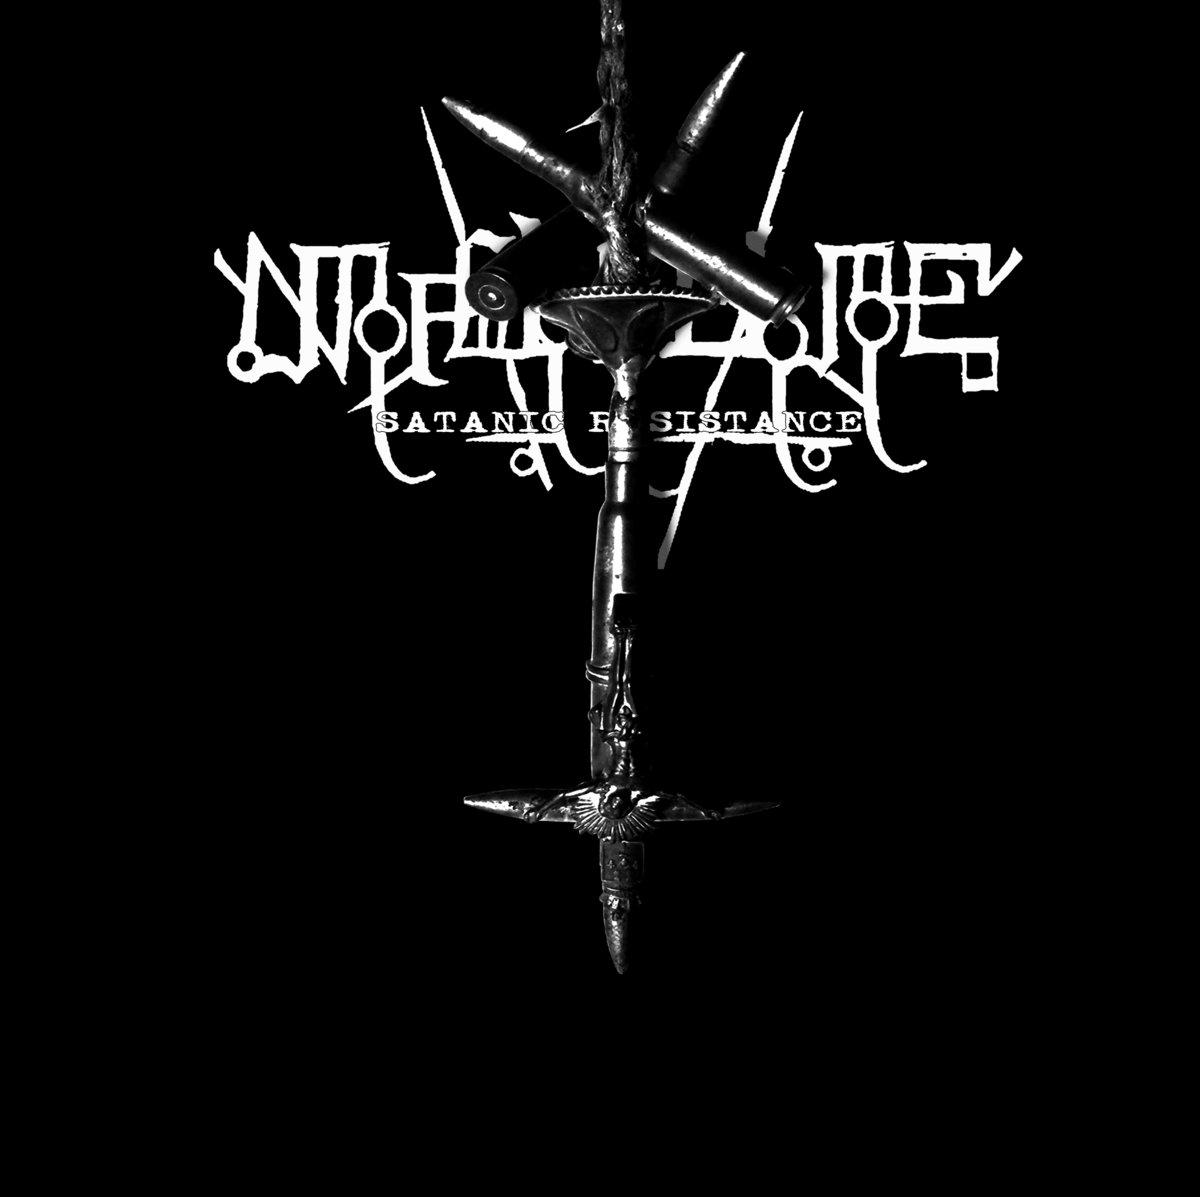 Malhkebre - Satanic Resistance